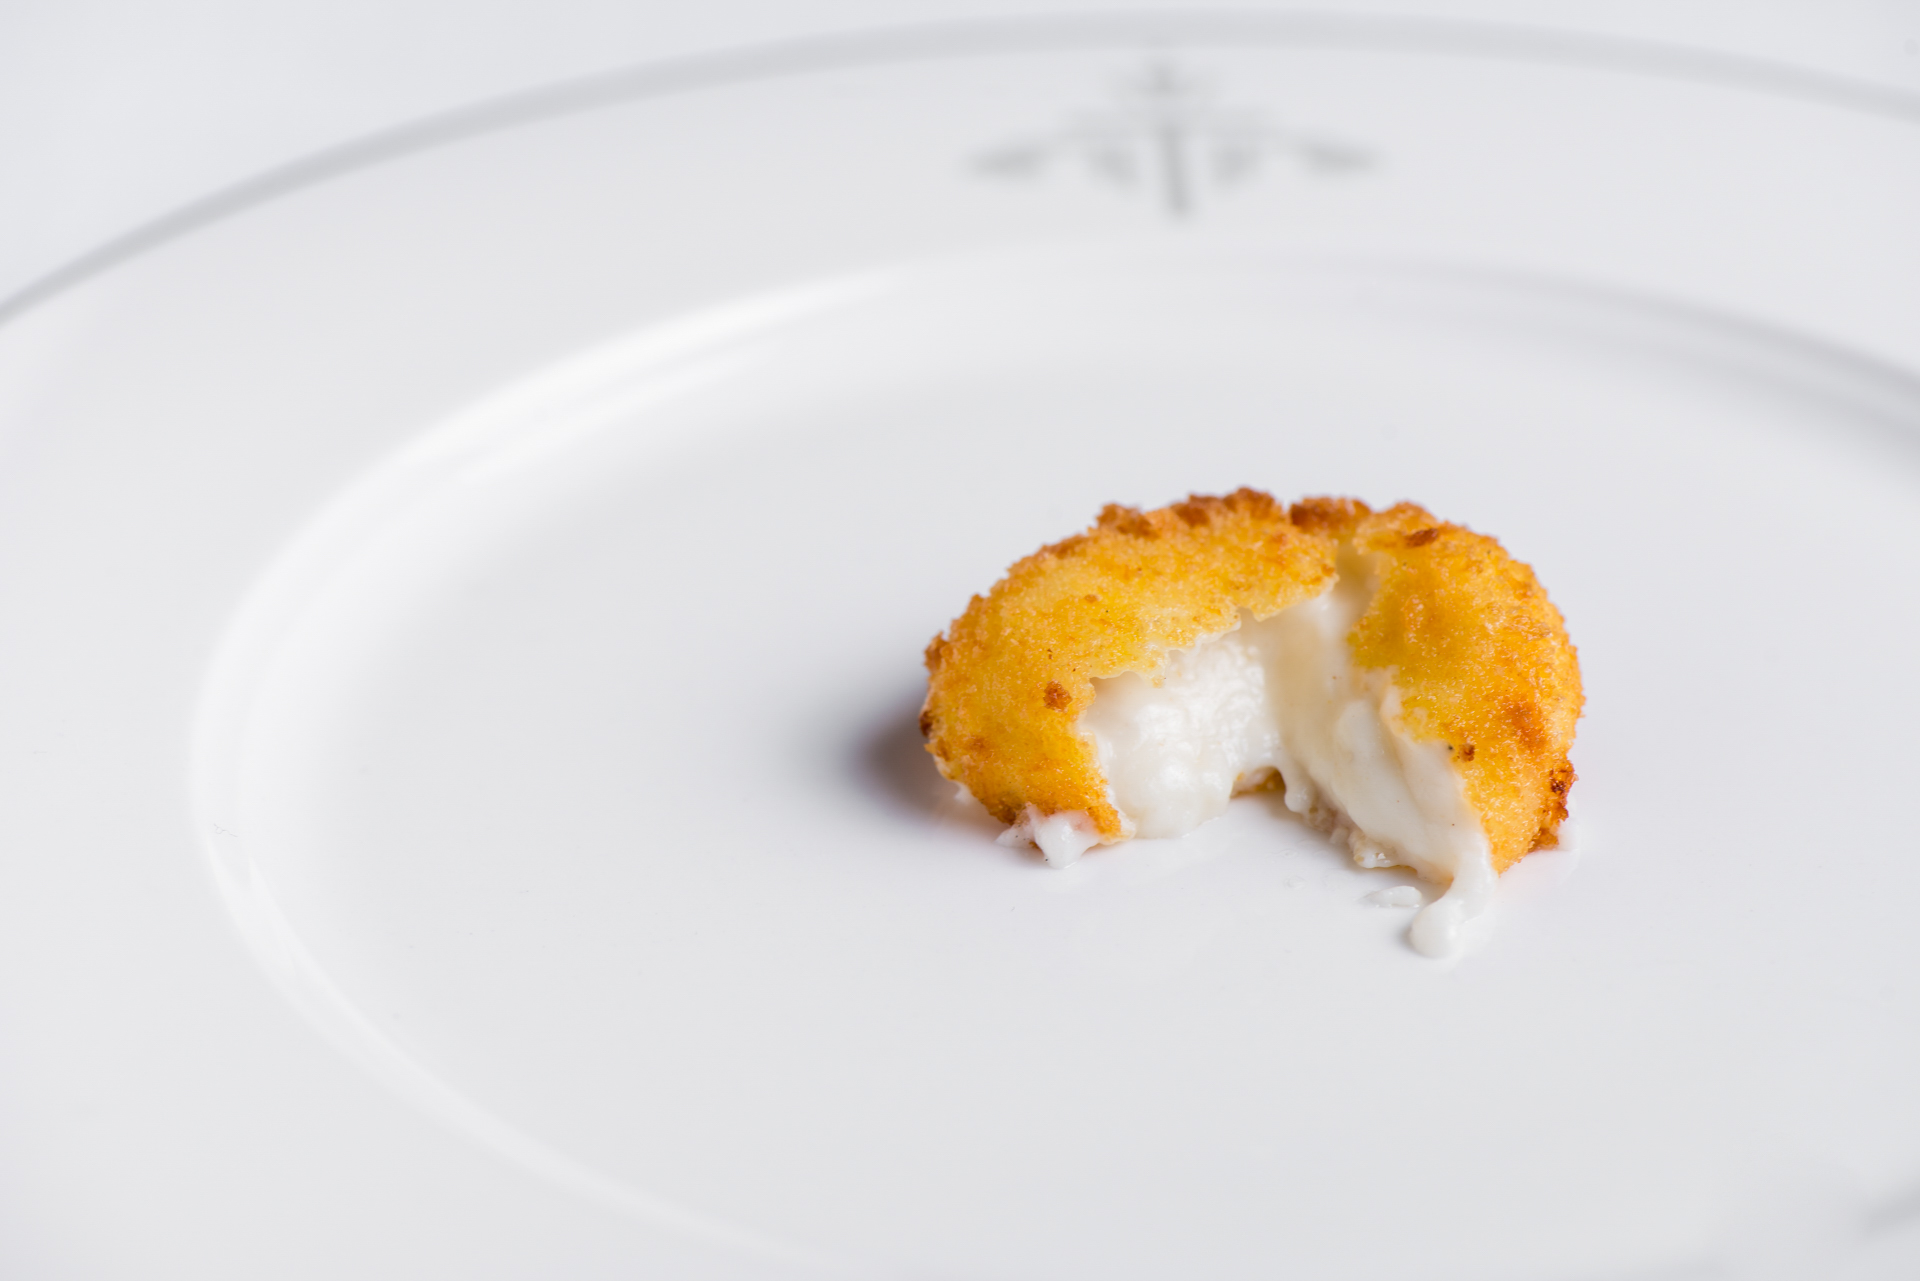 fotografo Tatel, Tatel Madrid, Fotografo gastronomia, jose salto